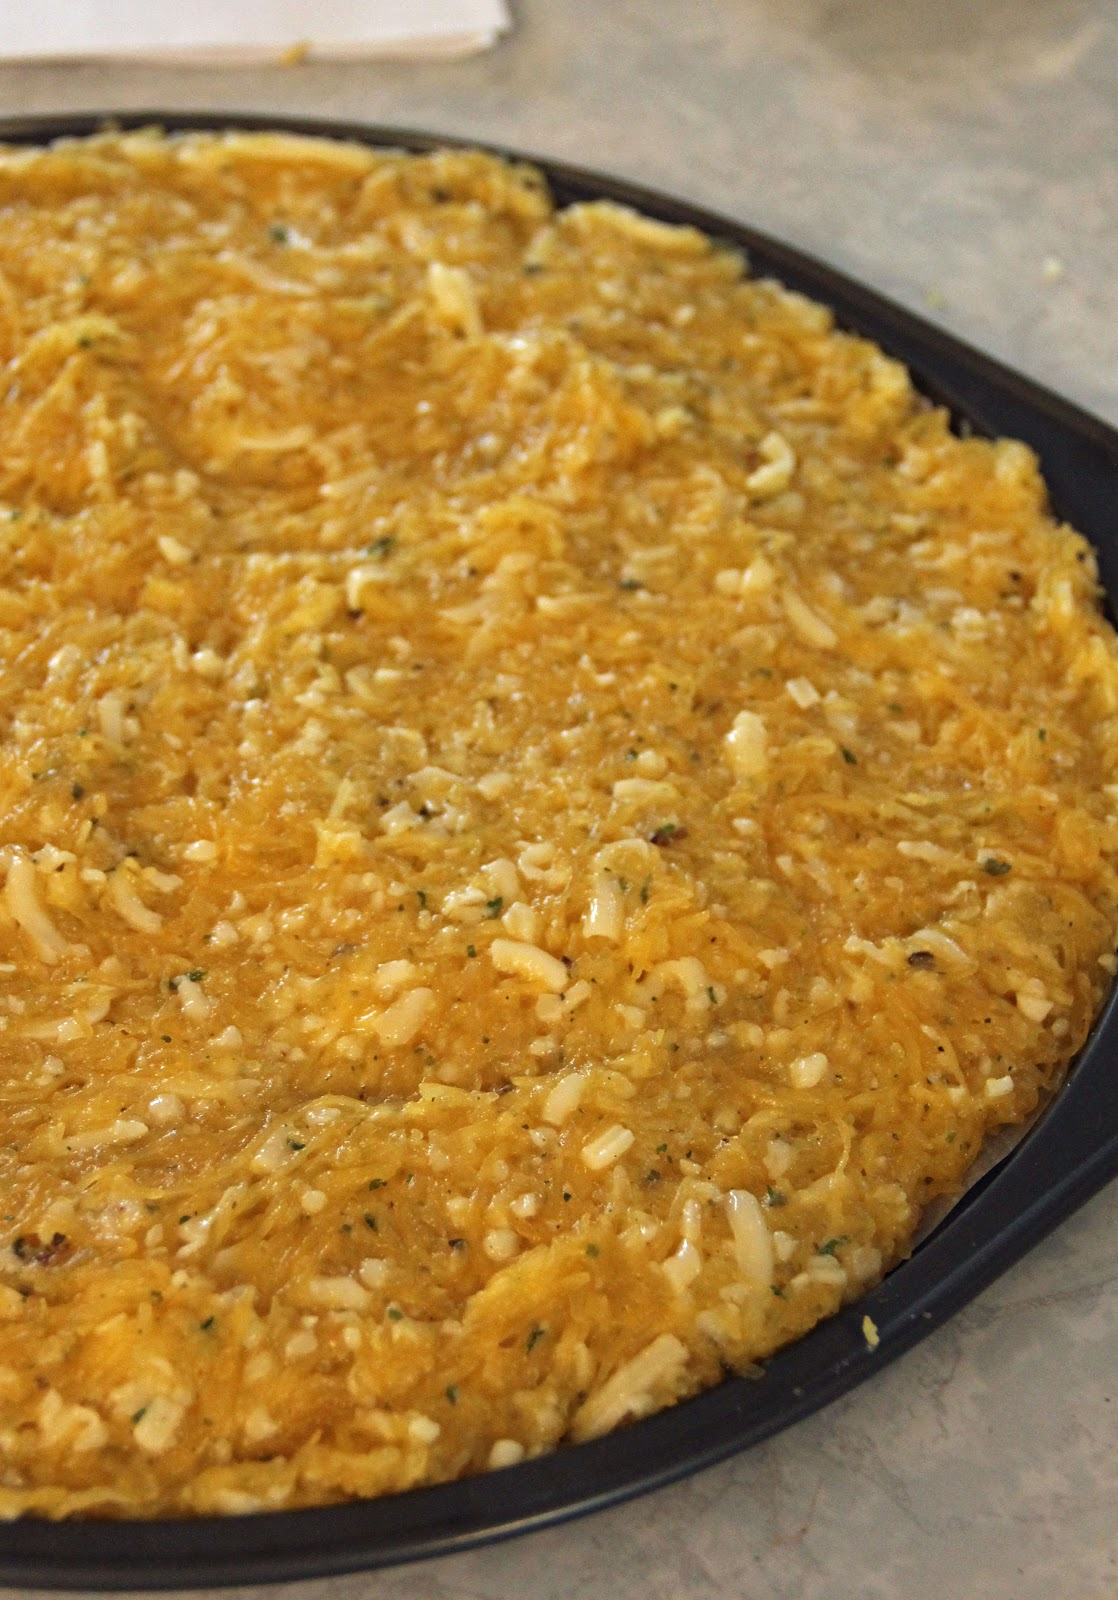 Oct 17, · 1 medium spaghetti squash. 2 tbsp coconut flour. 1 egg. 1 tsp dried oregano. 1/2 tsp garlic powder. 1/2 tsp salt. Freshly cracked black pepper, to taste. Pizza toppings: tomato sauce, cheese, pepperoni, mushrooms, vietapk.mlgs: